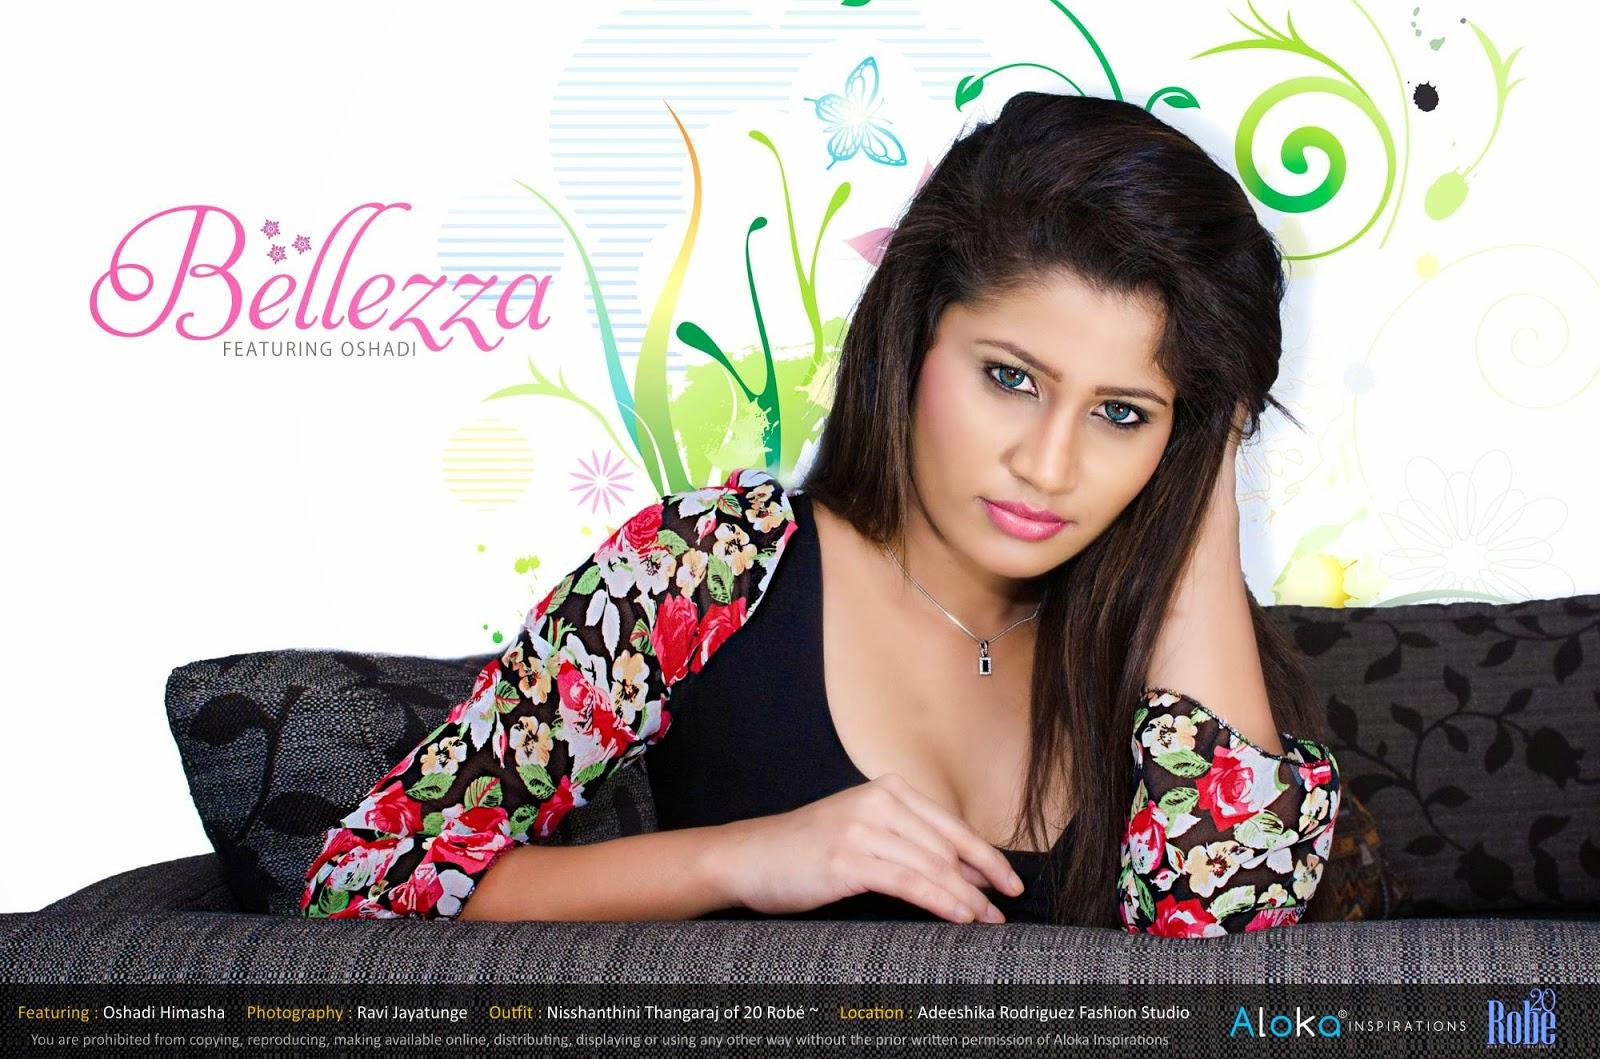 BELLEZZA by Aloka Inspirations Ft. Oshadi Himasha